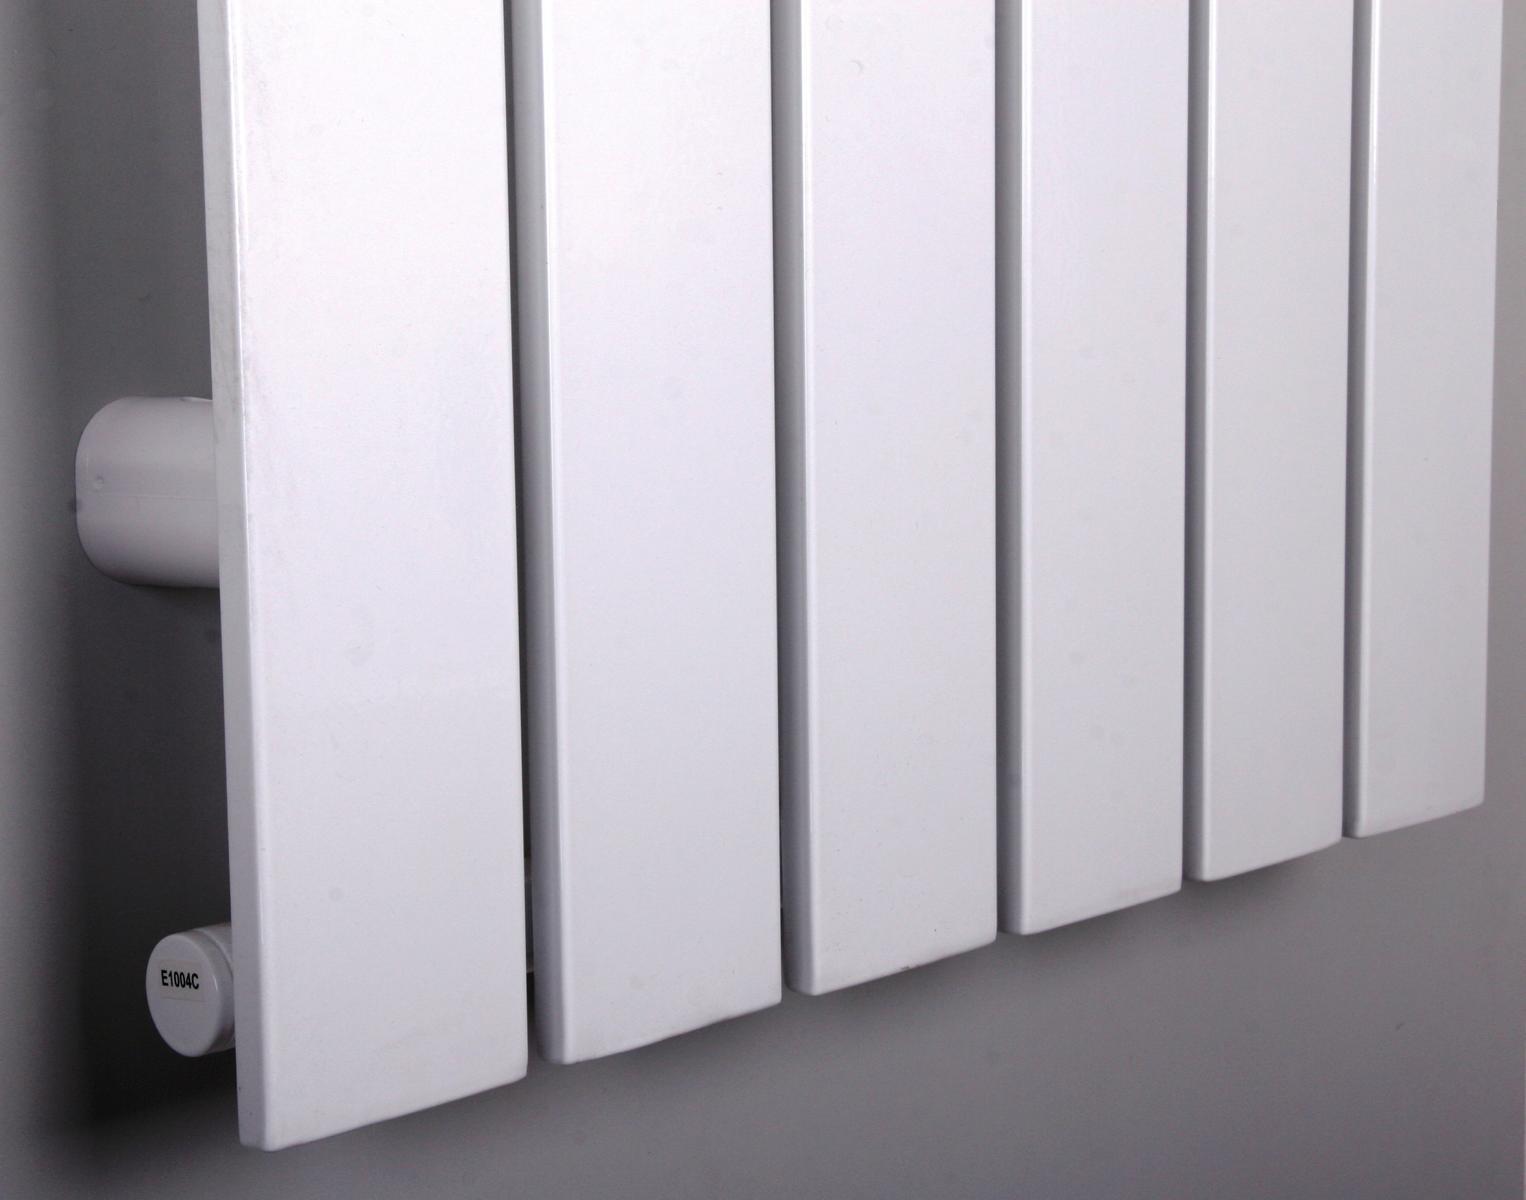 Full Size of Handtuchhalter Heizkörper Badheizkrper Peking 2 Elektroheizkörper Bad Für Küche Wohnzimmer Badezimmer Wohnzimmer Handtuchhalter Heizkörper